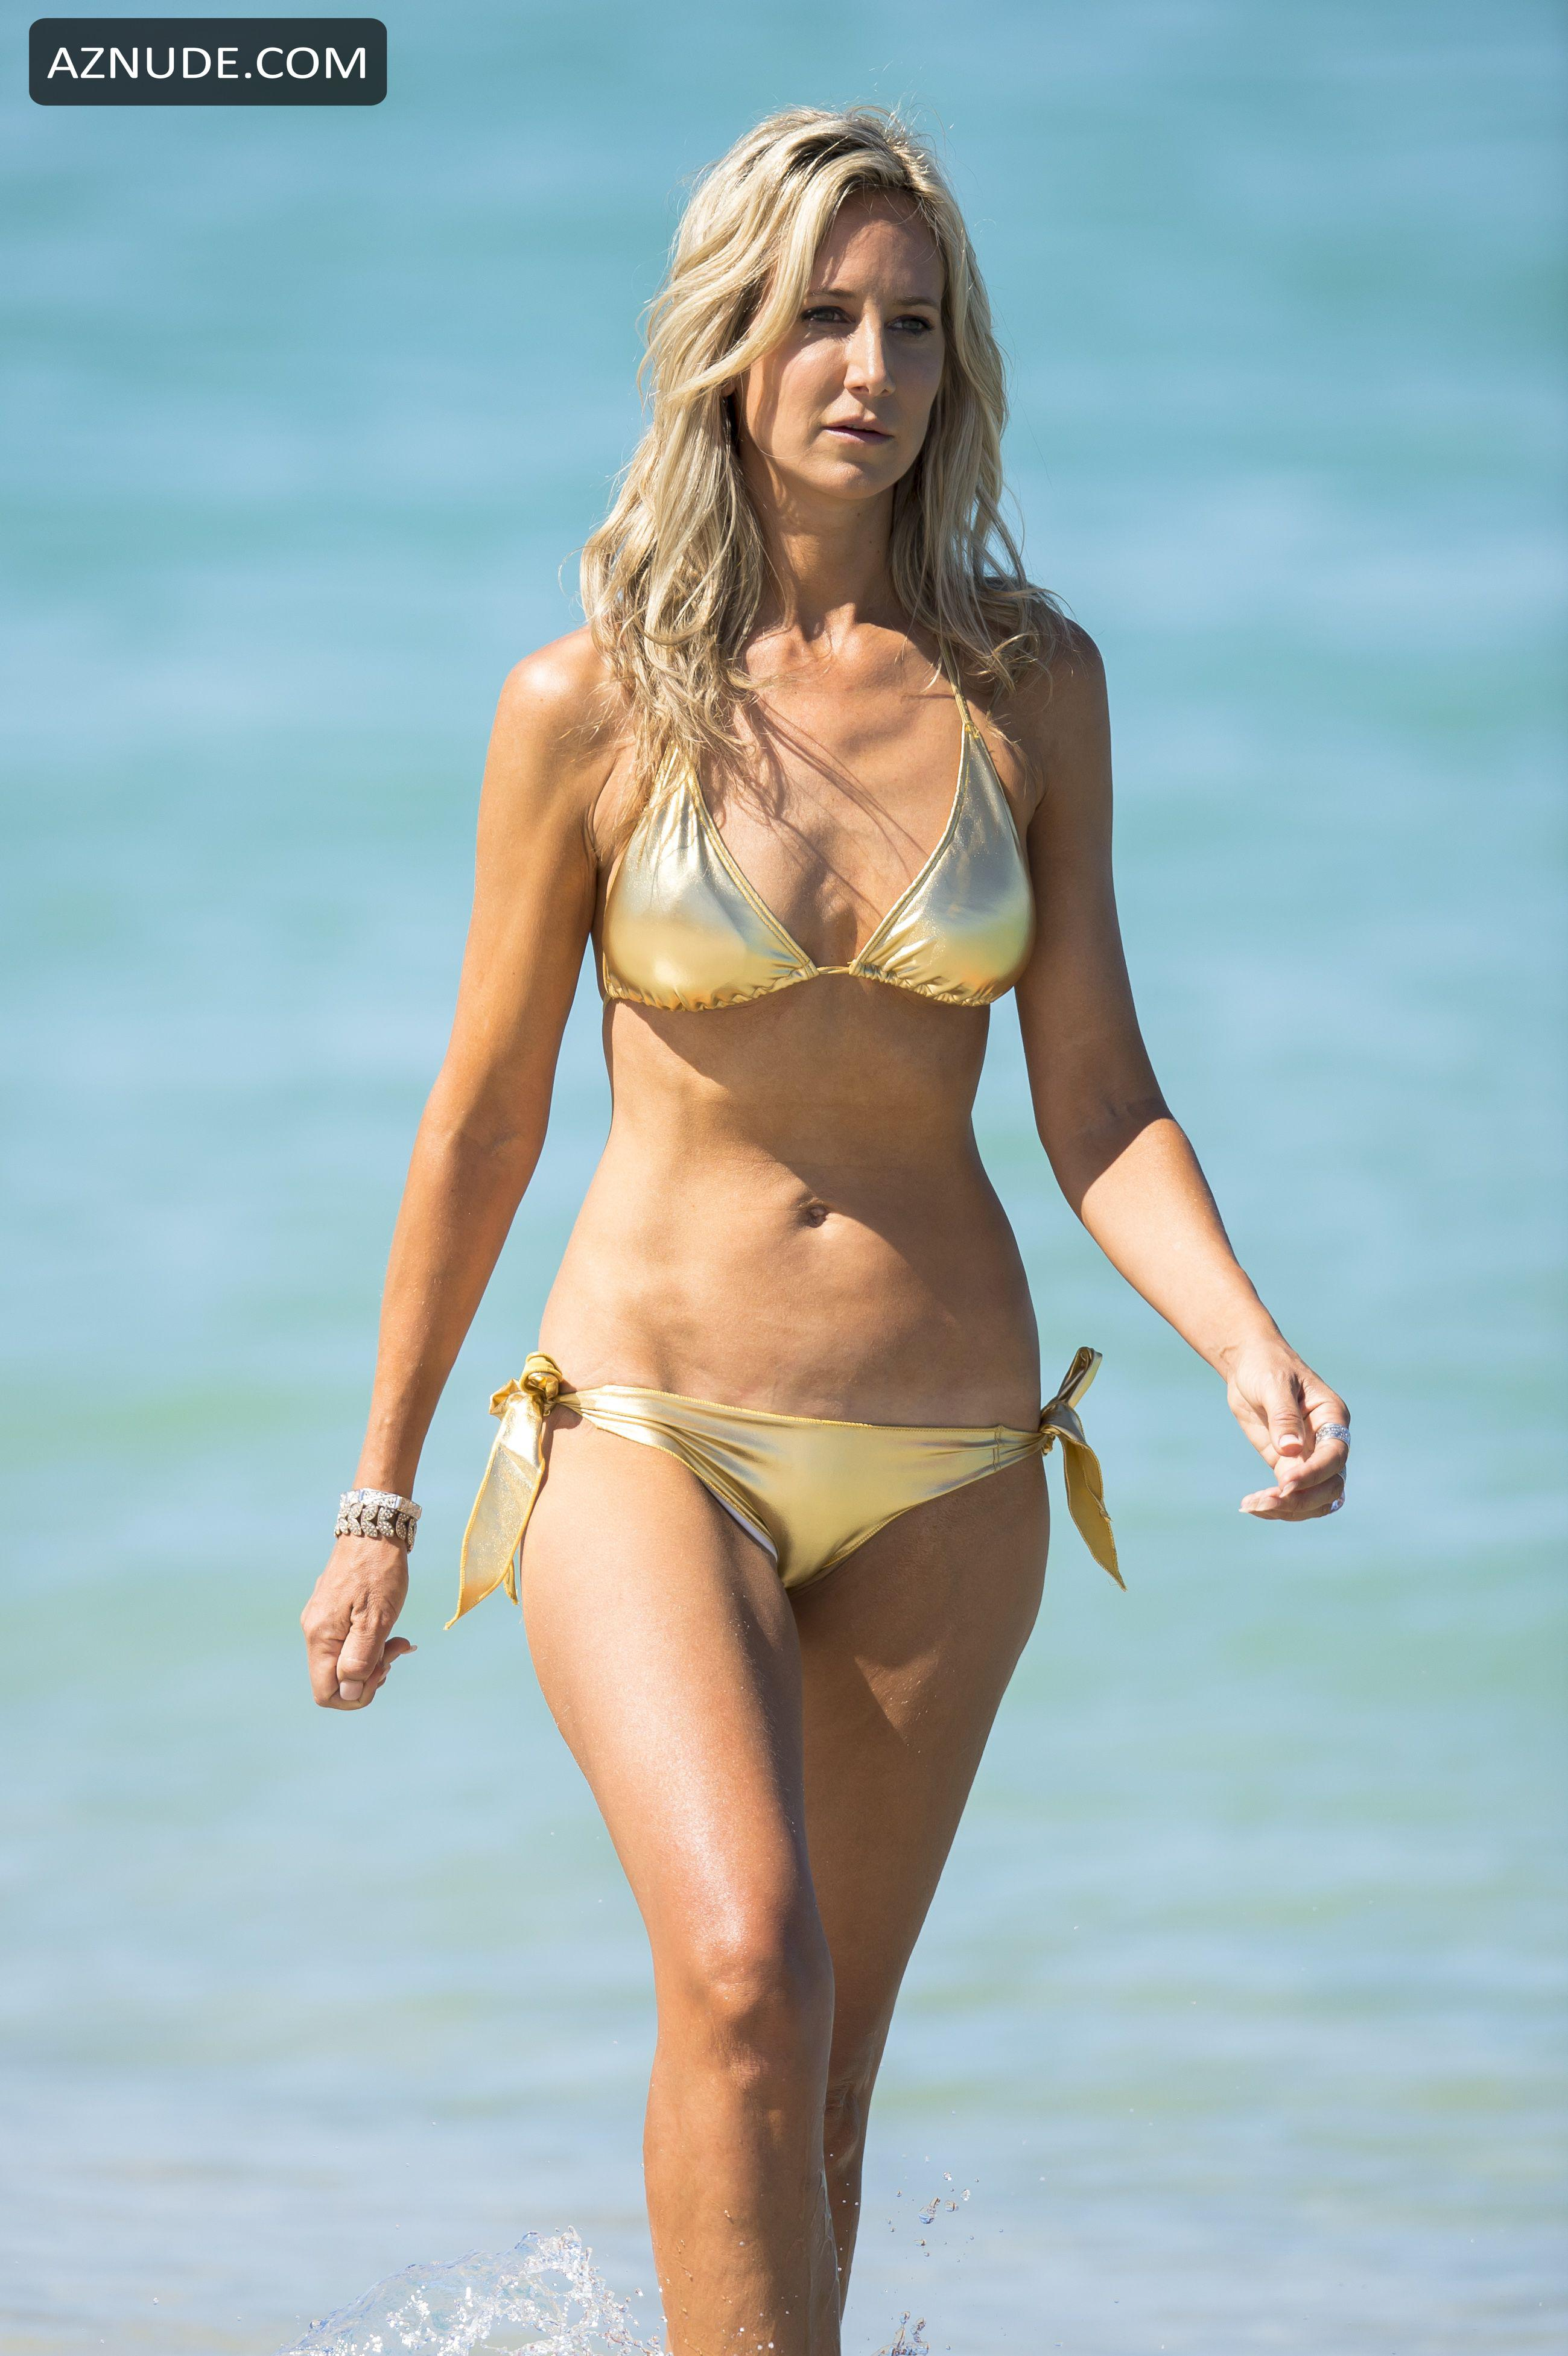 Bikini Gemma Ward Nude Pics HD